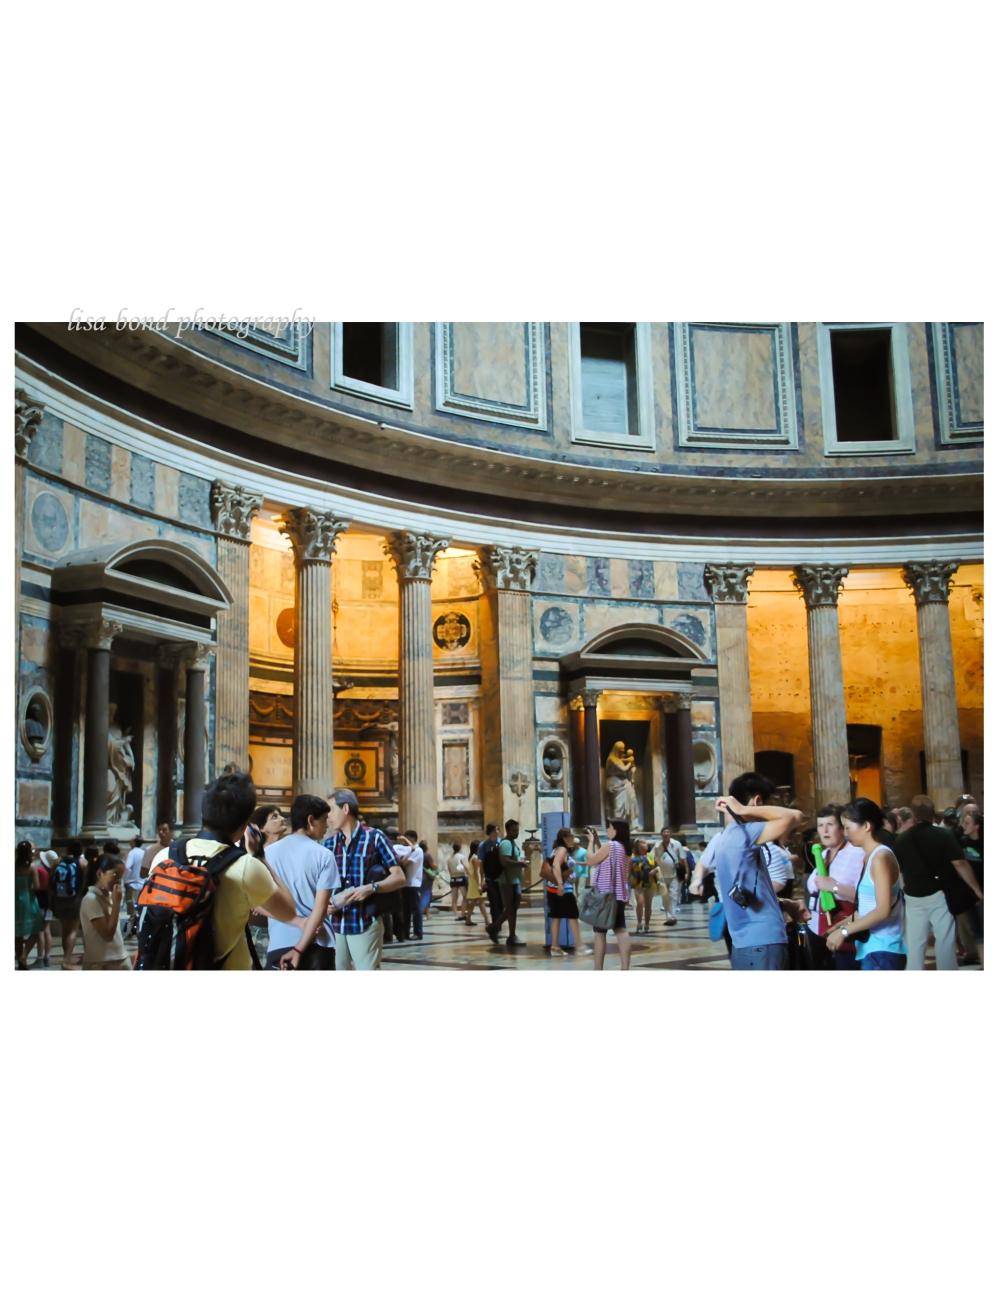 #Italy, #Pantheon, #architecture